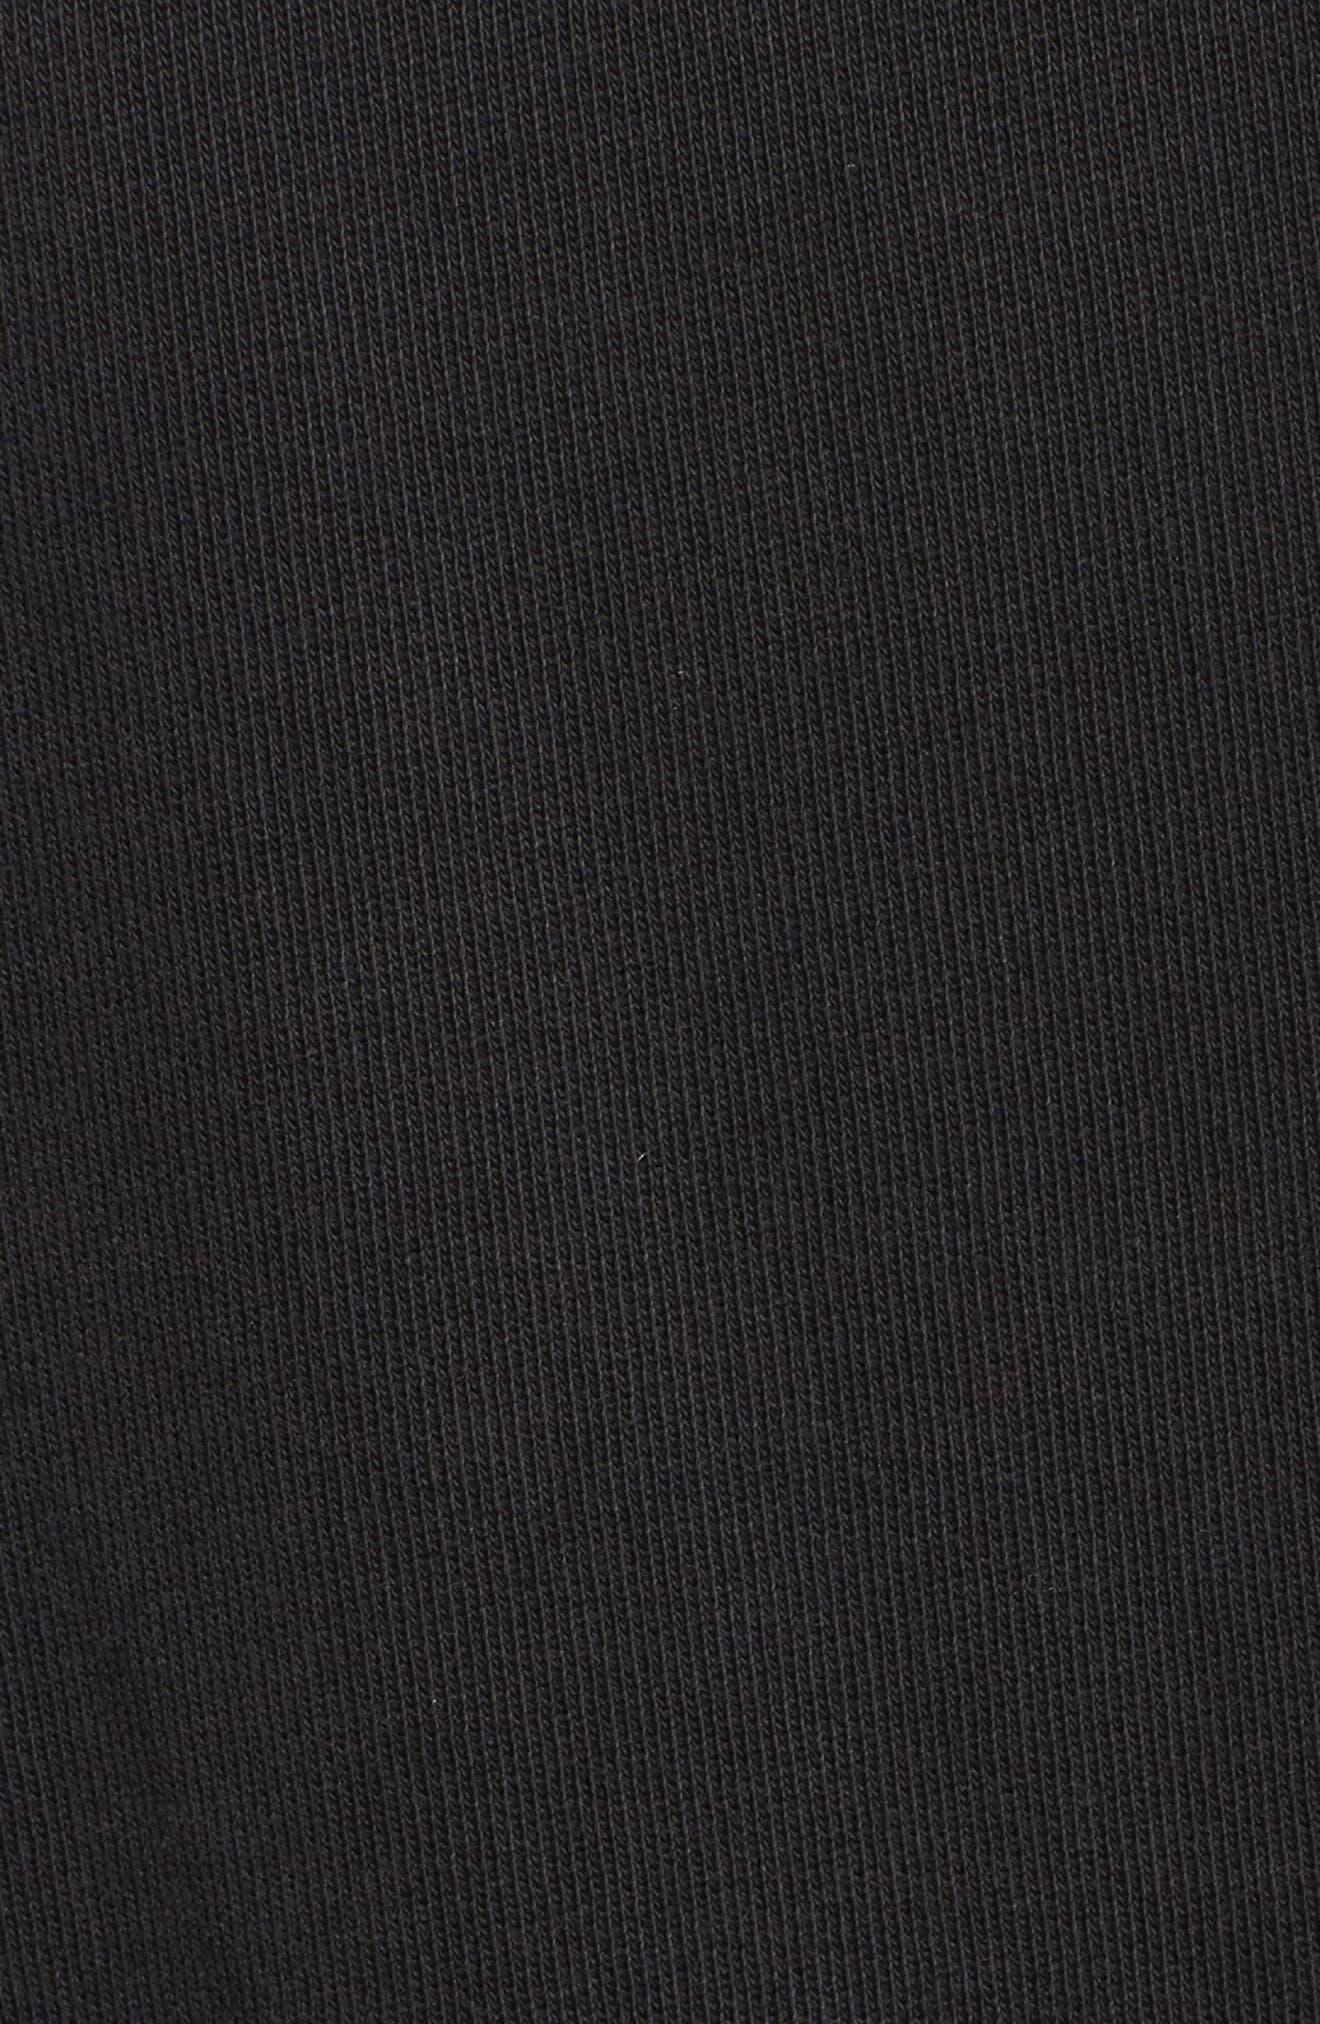 Distressed Boyfriend Sweatshirt,                             Alternate thumbnail 5, color,                             001